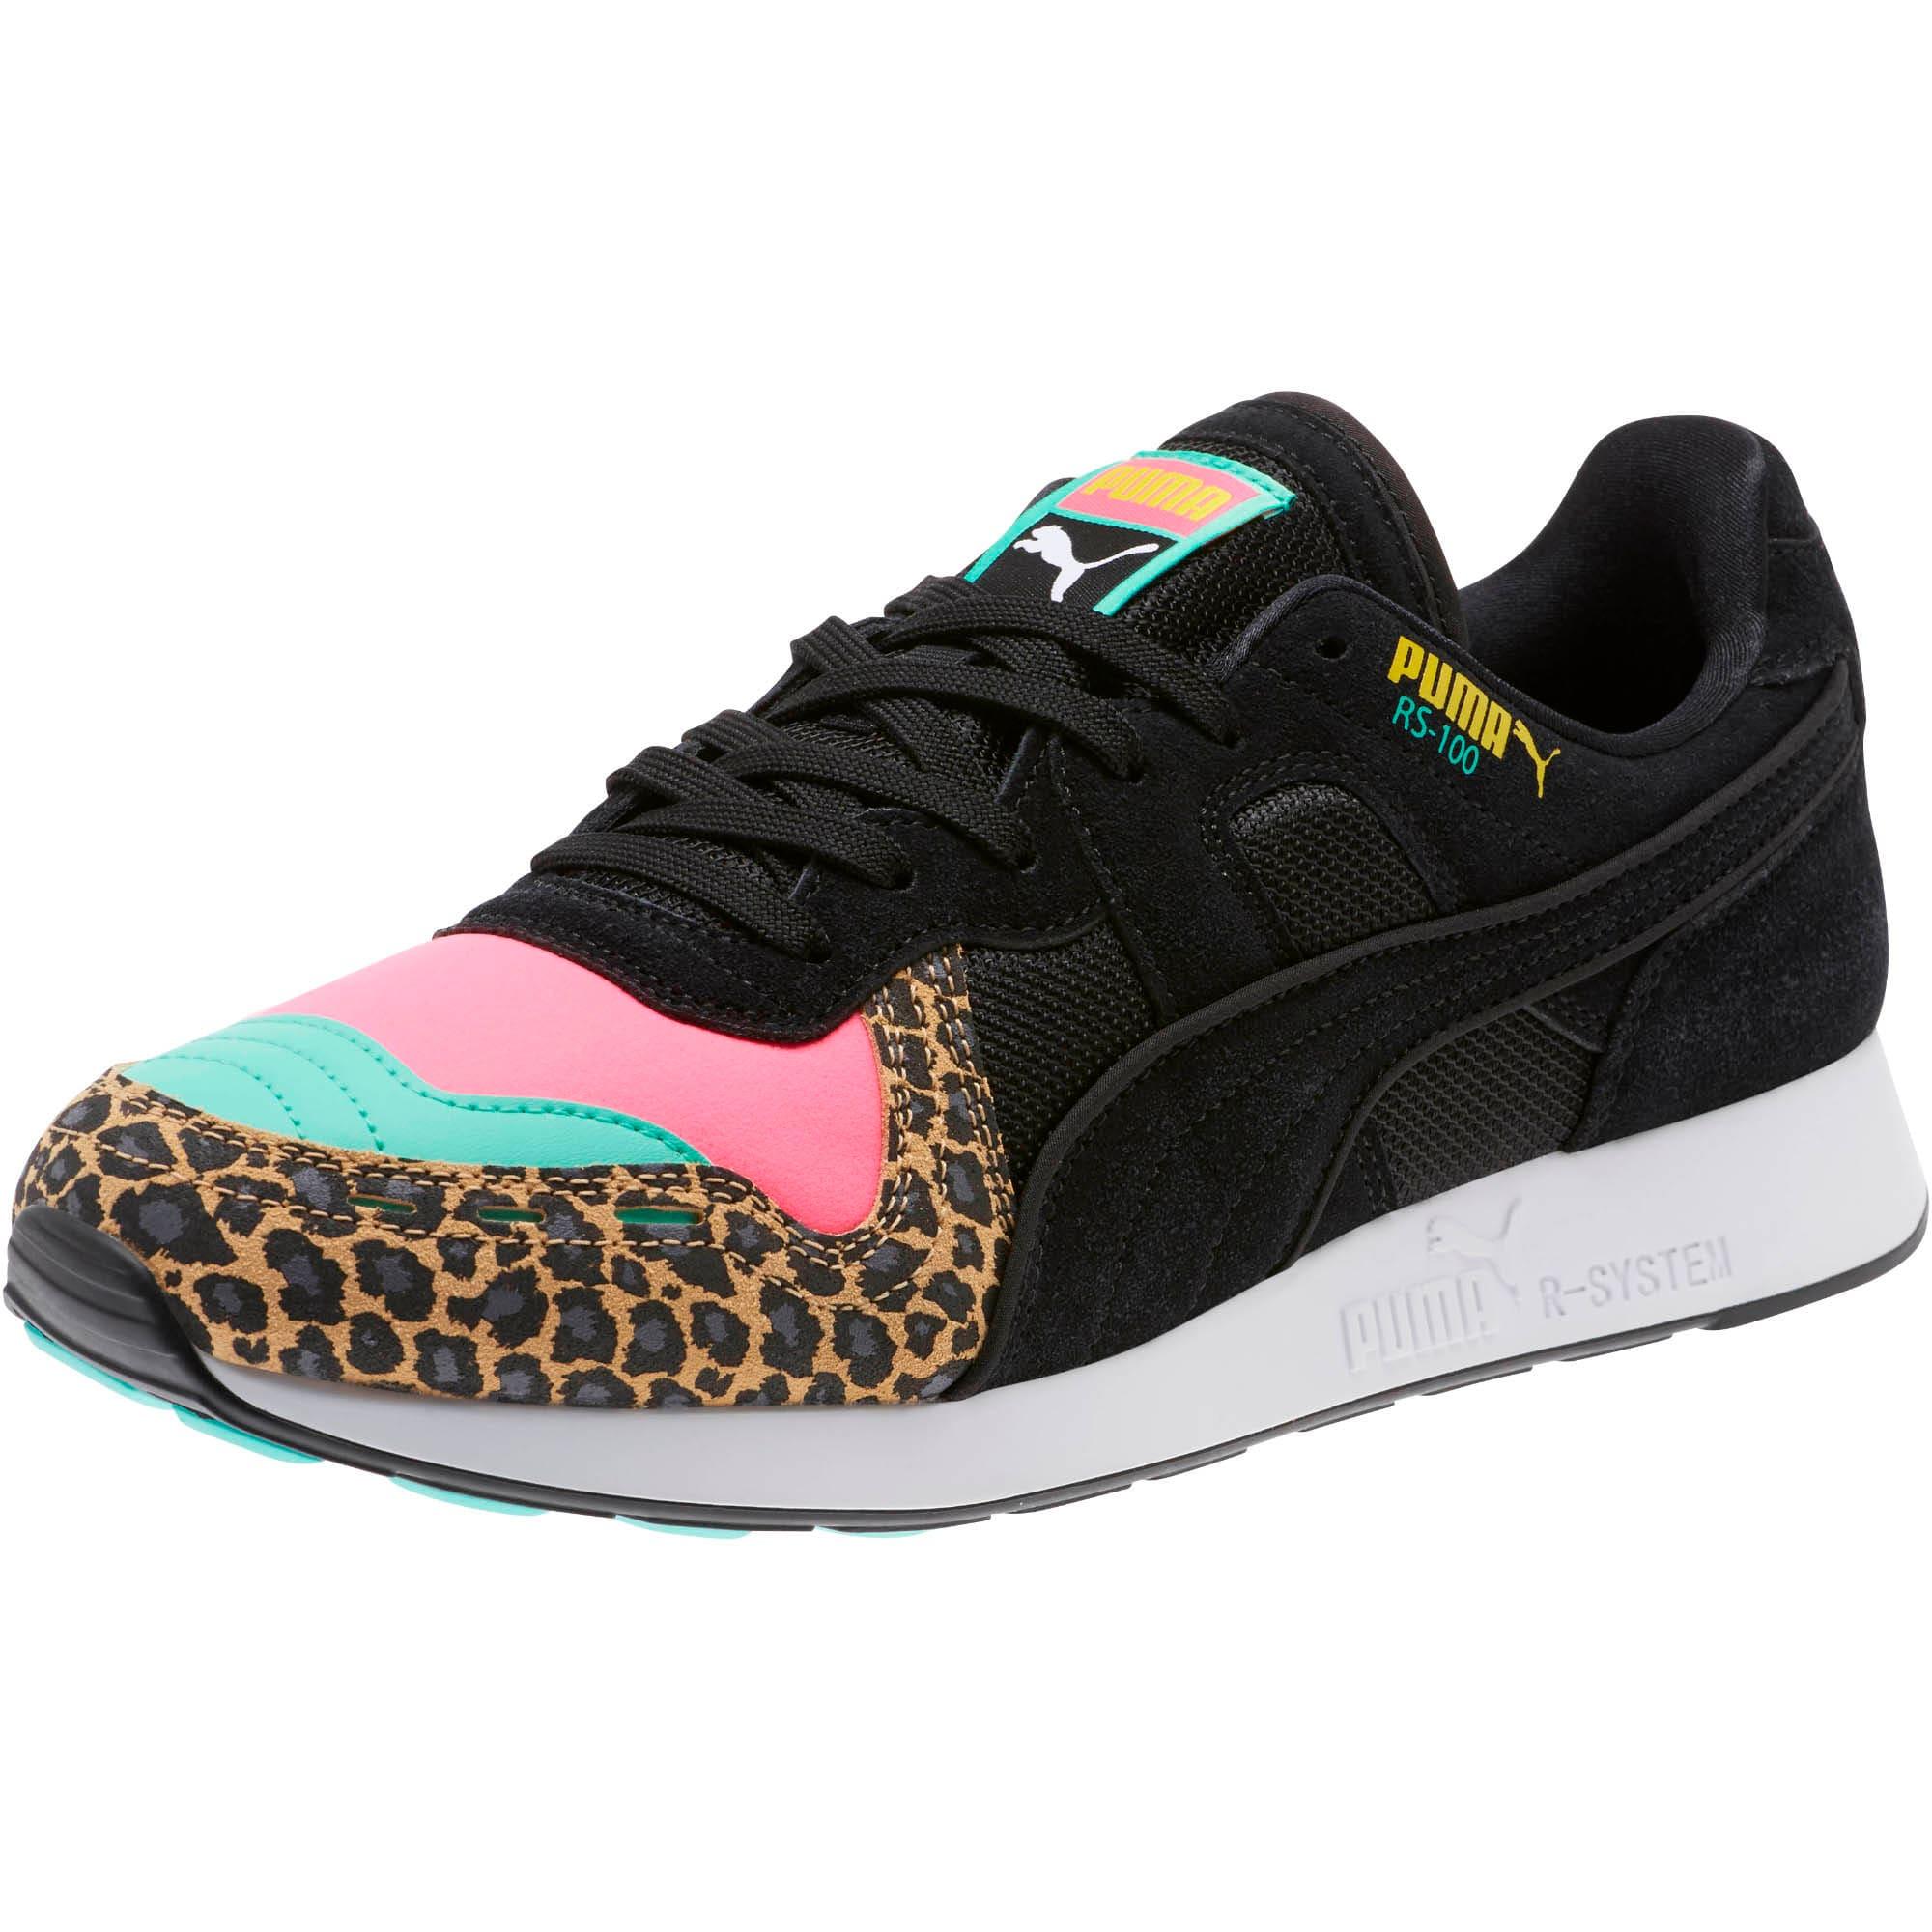 Thumbnail 1 of RS-100 Party Cheetah Sneakers, KNOCKOUT PINK-Puma Black, medium